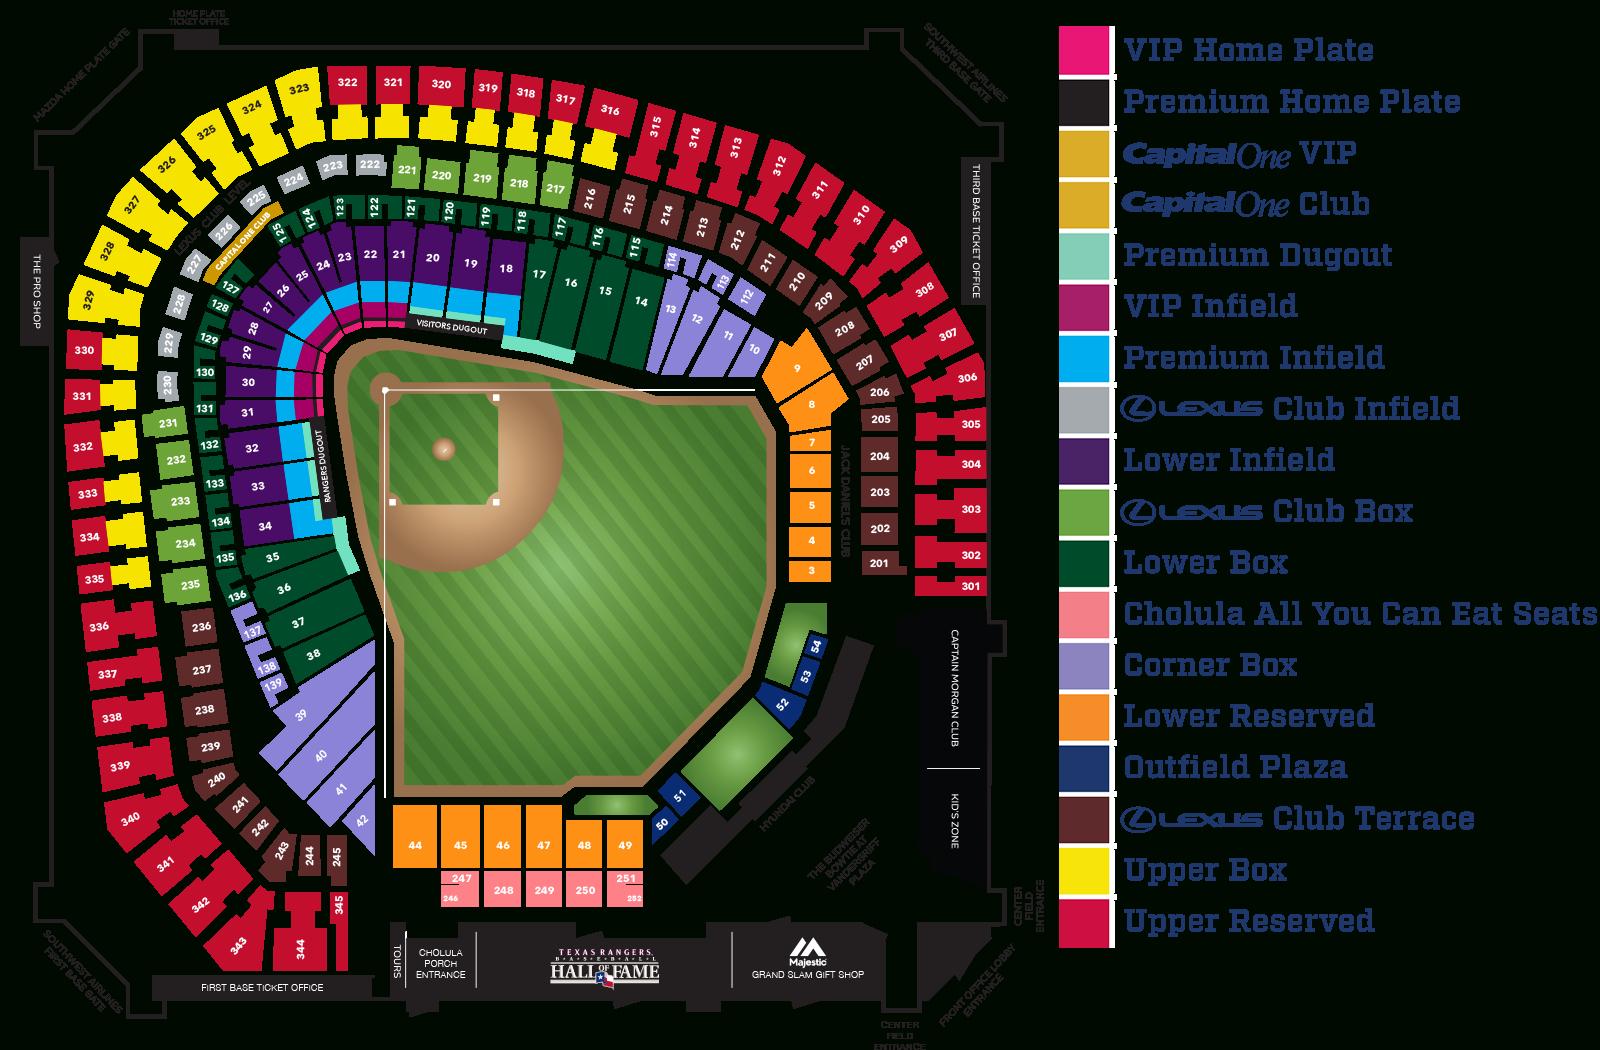 Globe Life Park Seating Map ~ Afp Cv - Texas Rangers Ballpark Map